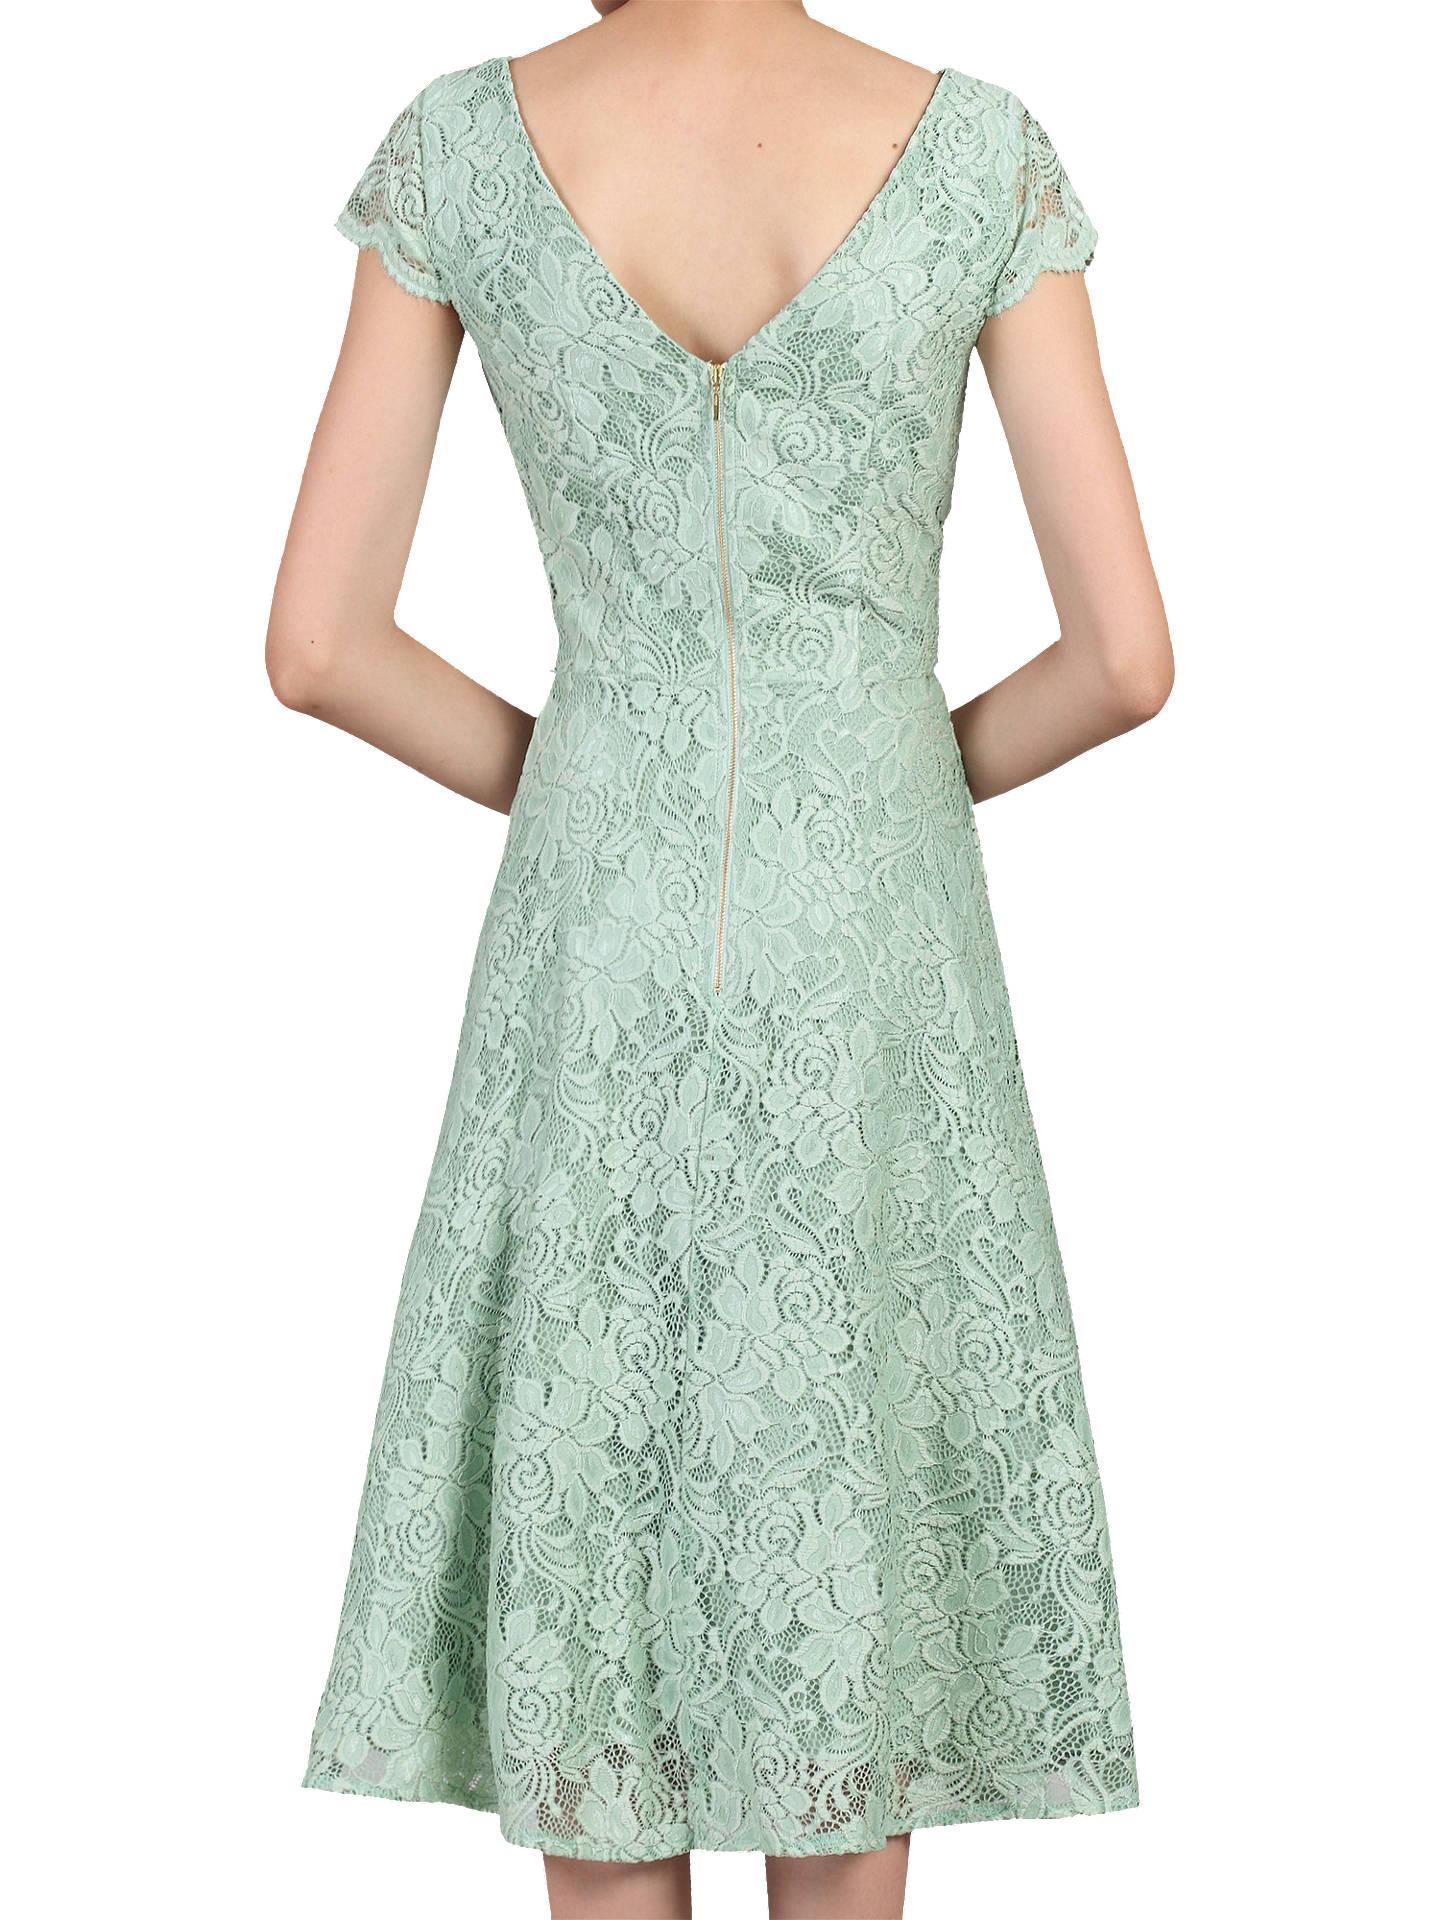 61f2a5937 ... Buy Jolie Moi Cap Sleeve Scalloped Lace Dress, Light Green, 6 Online at  johnlewis ...